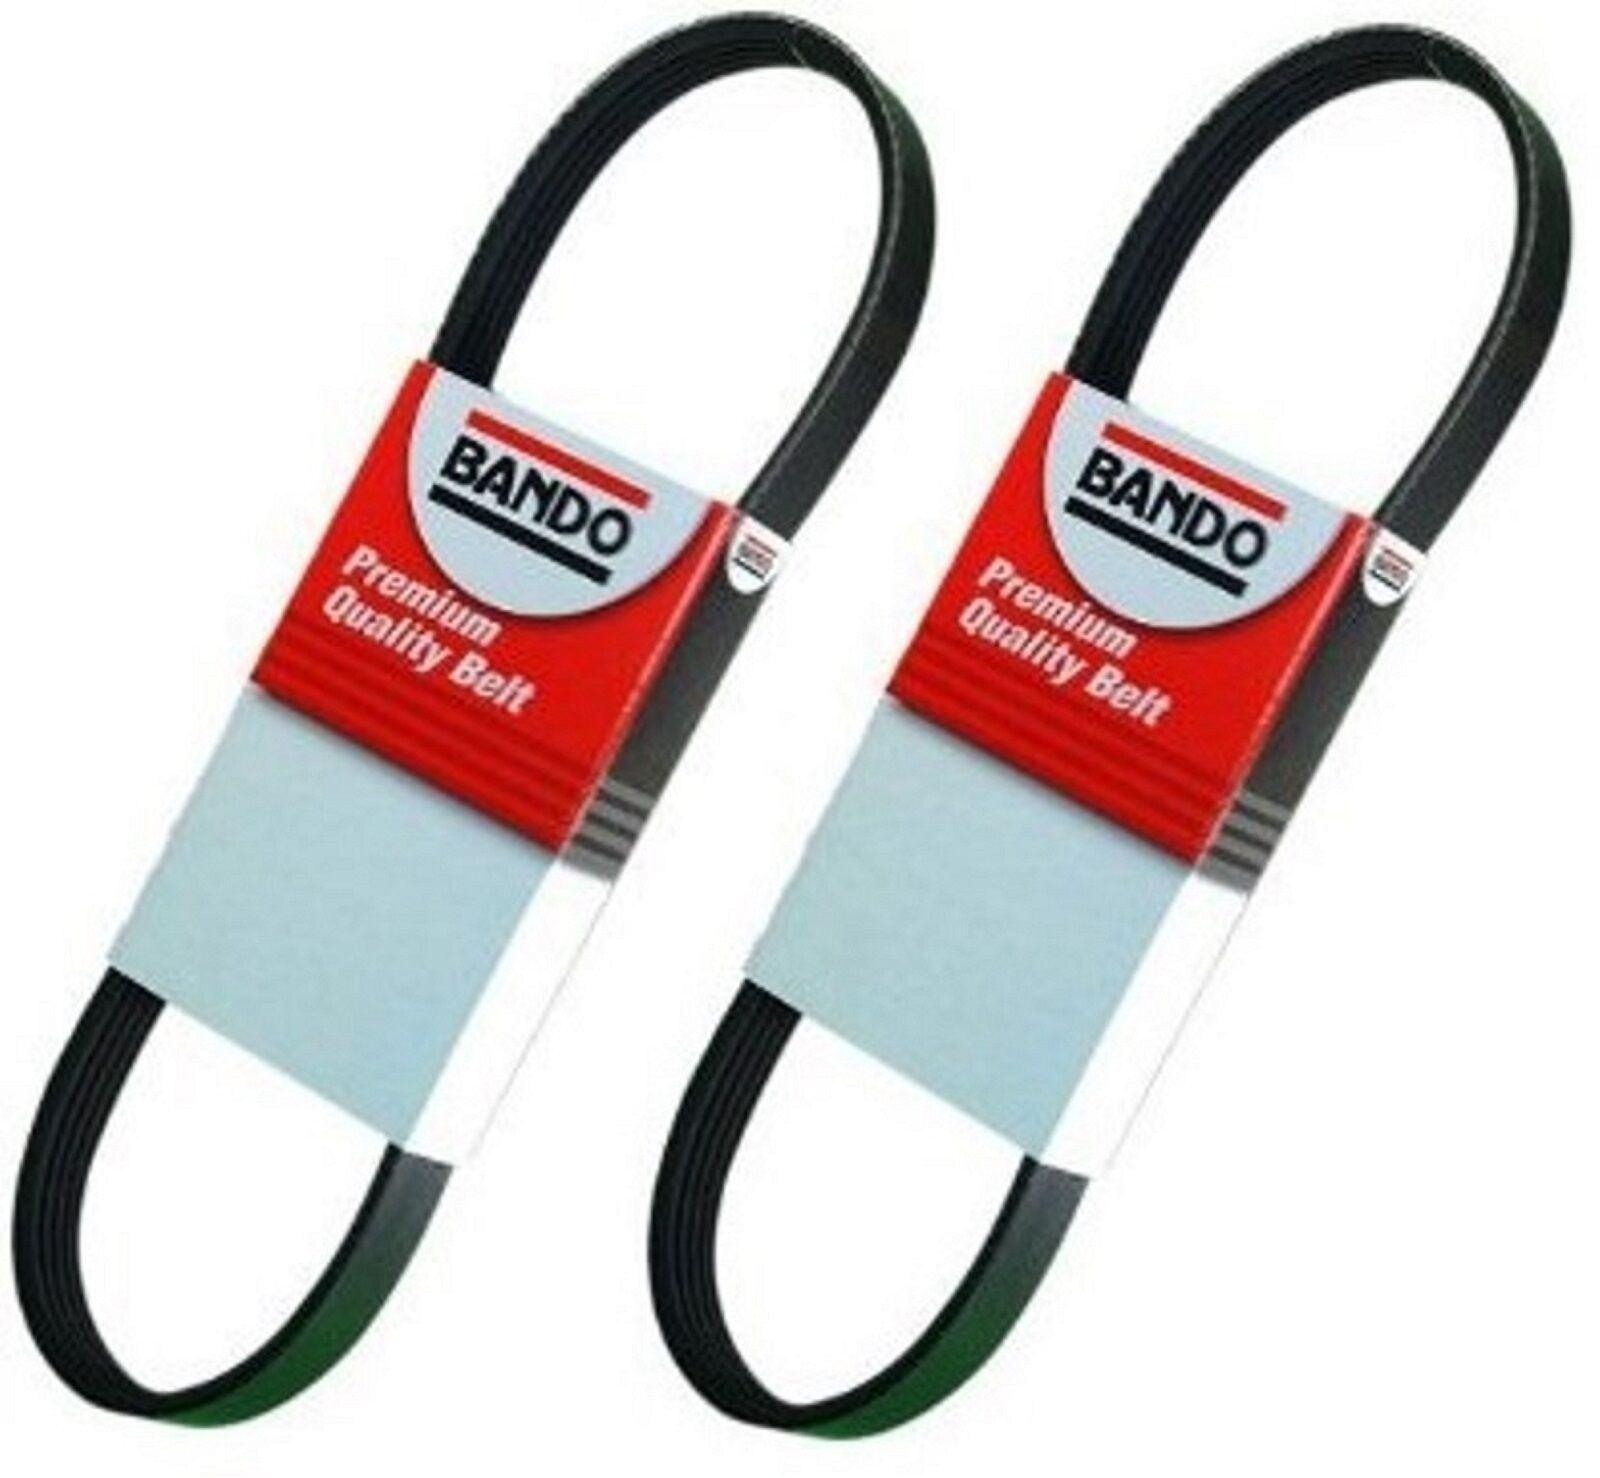 METRIC STANDARD 6PK1015 Replacement Belt